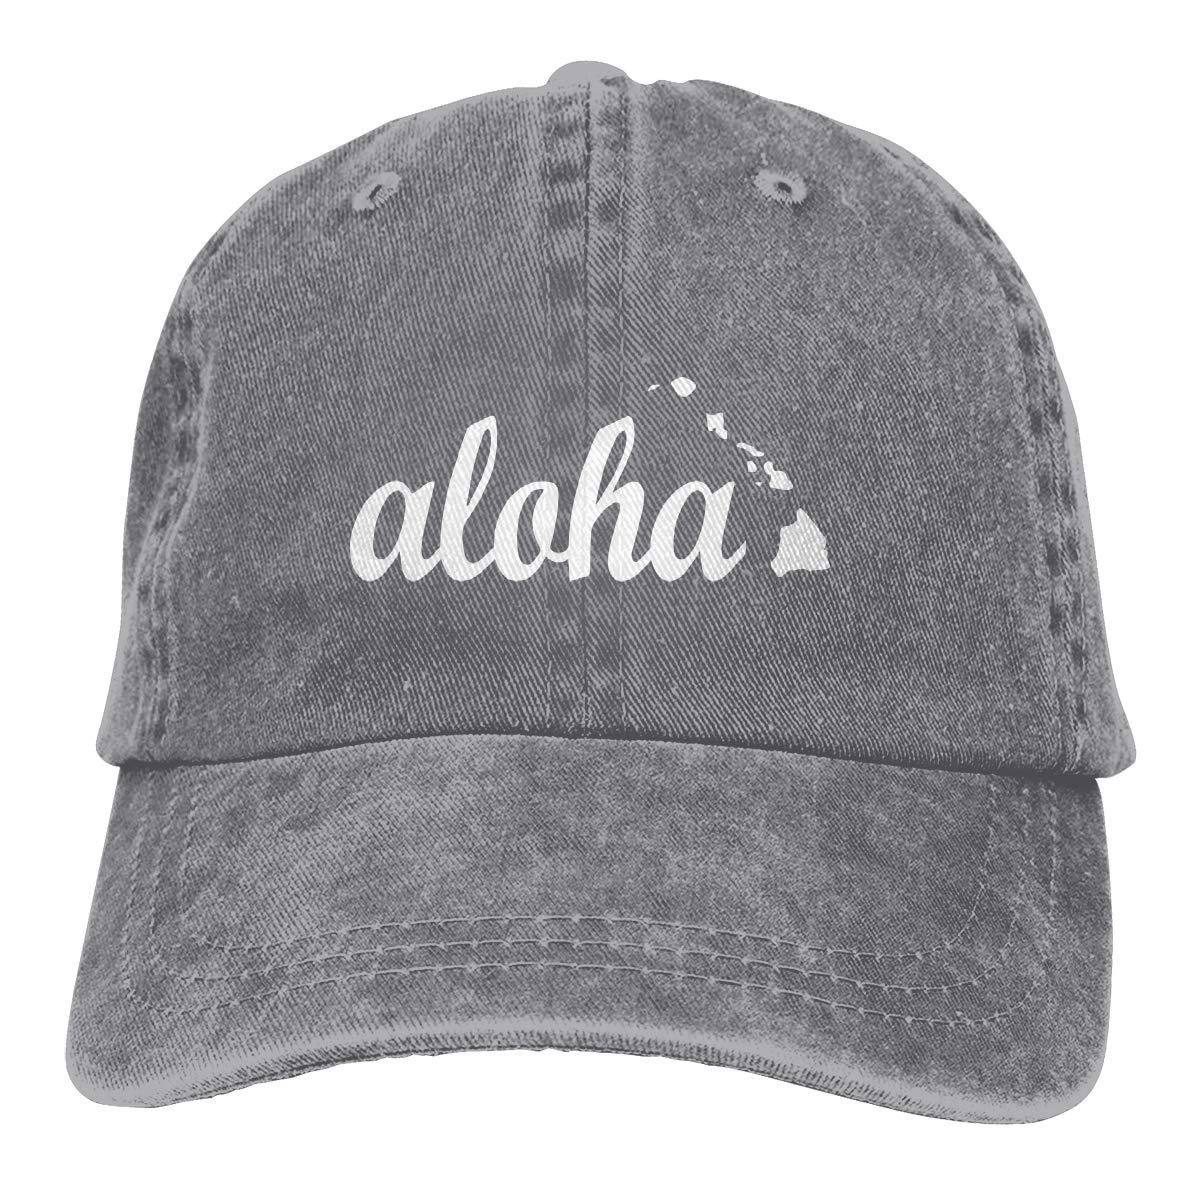 Aloha Adult Custom Cowboy Sun Hat Adjustable Baseball Cap